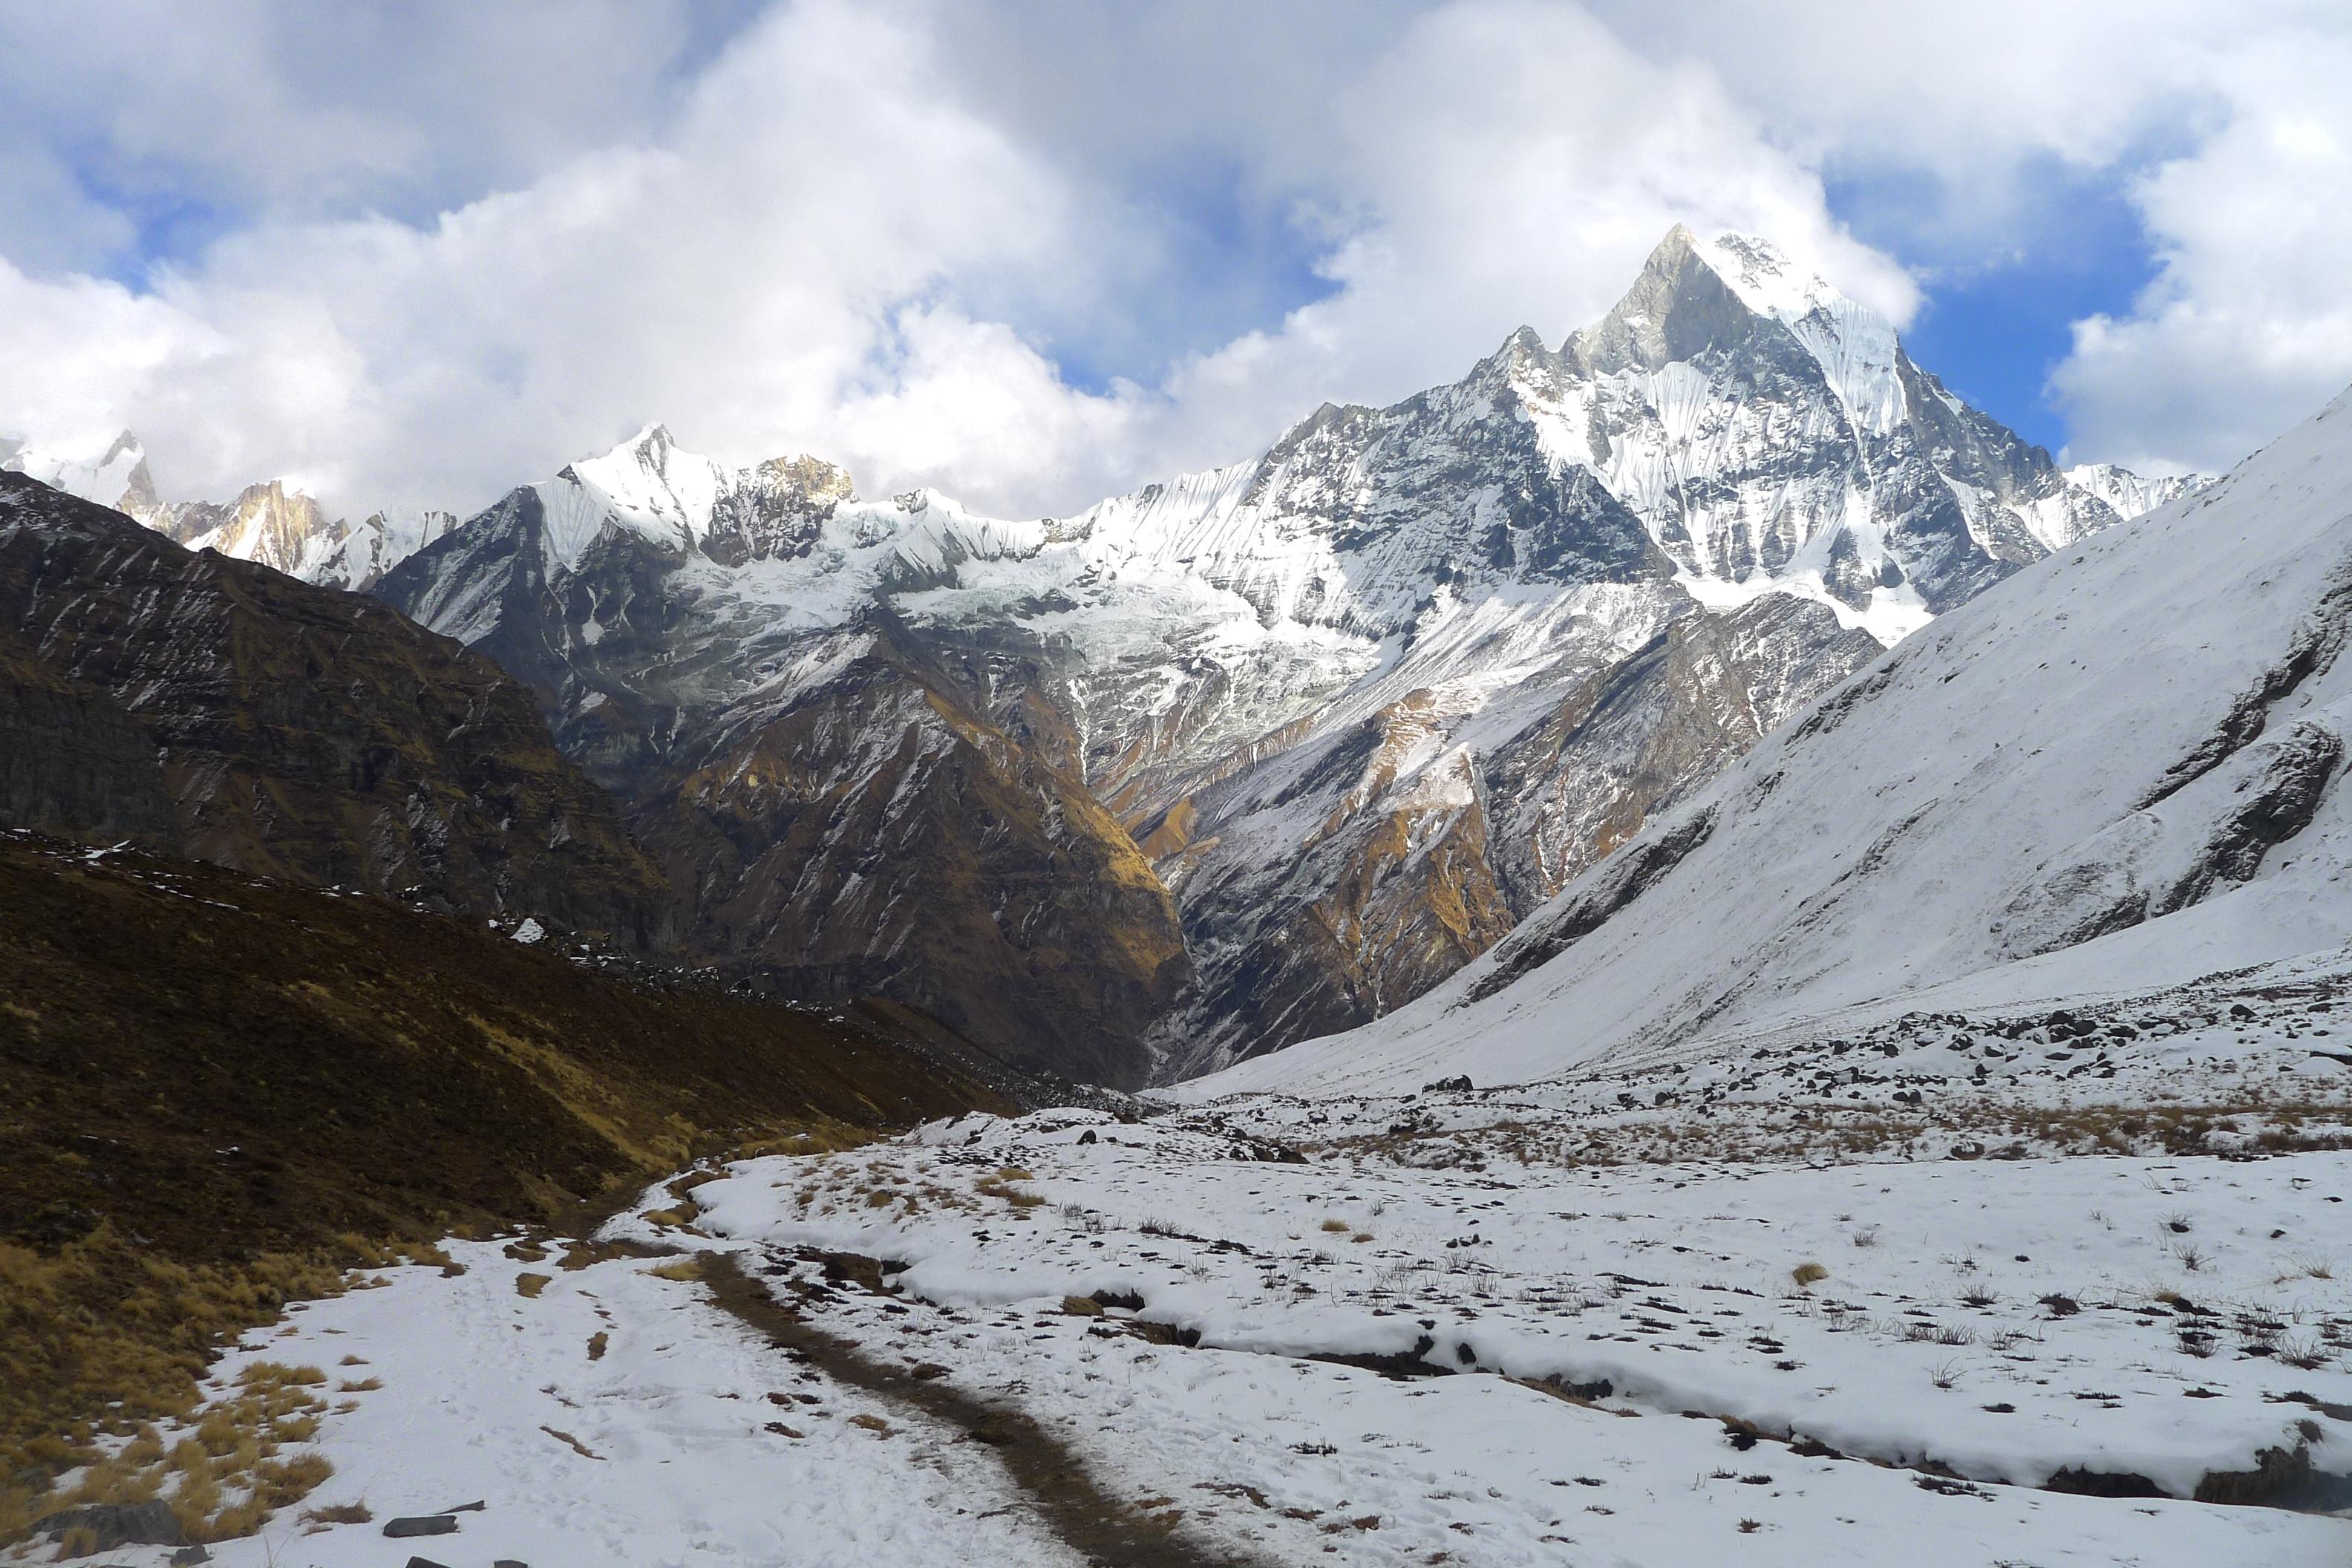 mountain-snow-winter-valley-mountain-range-weather-719131-pxhere.com